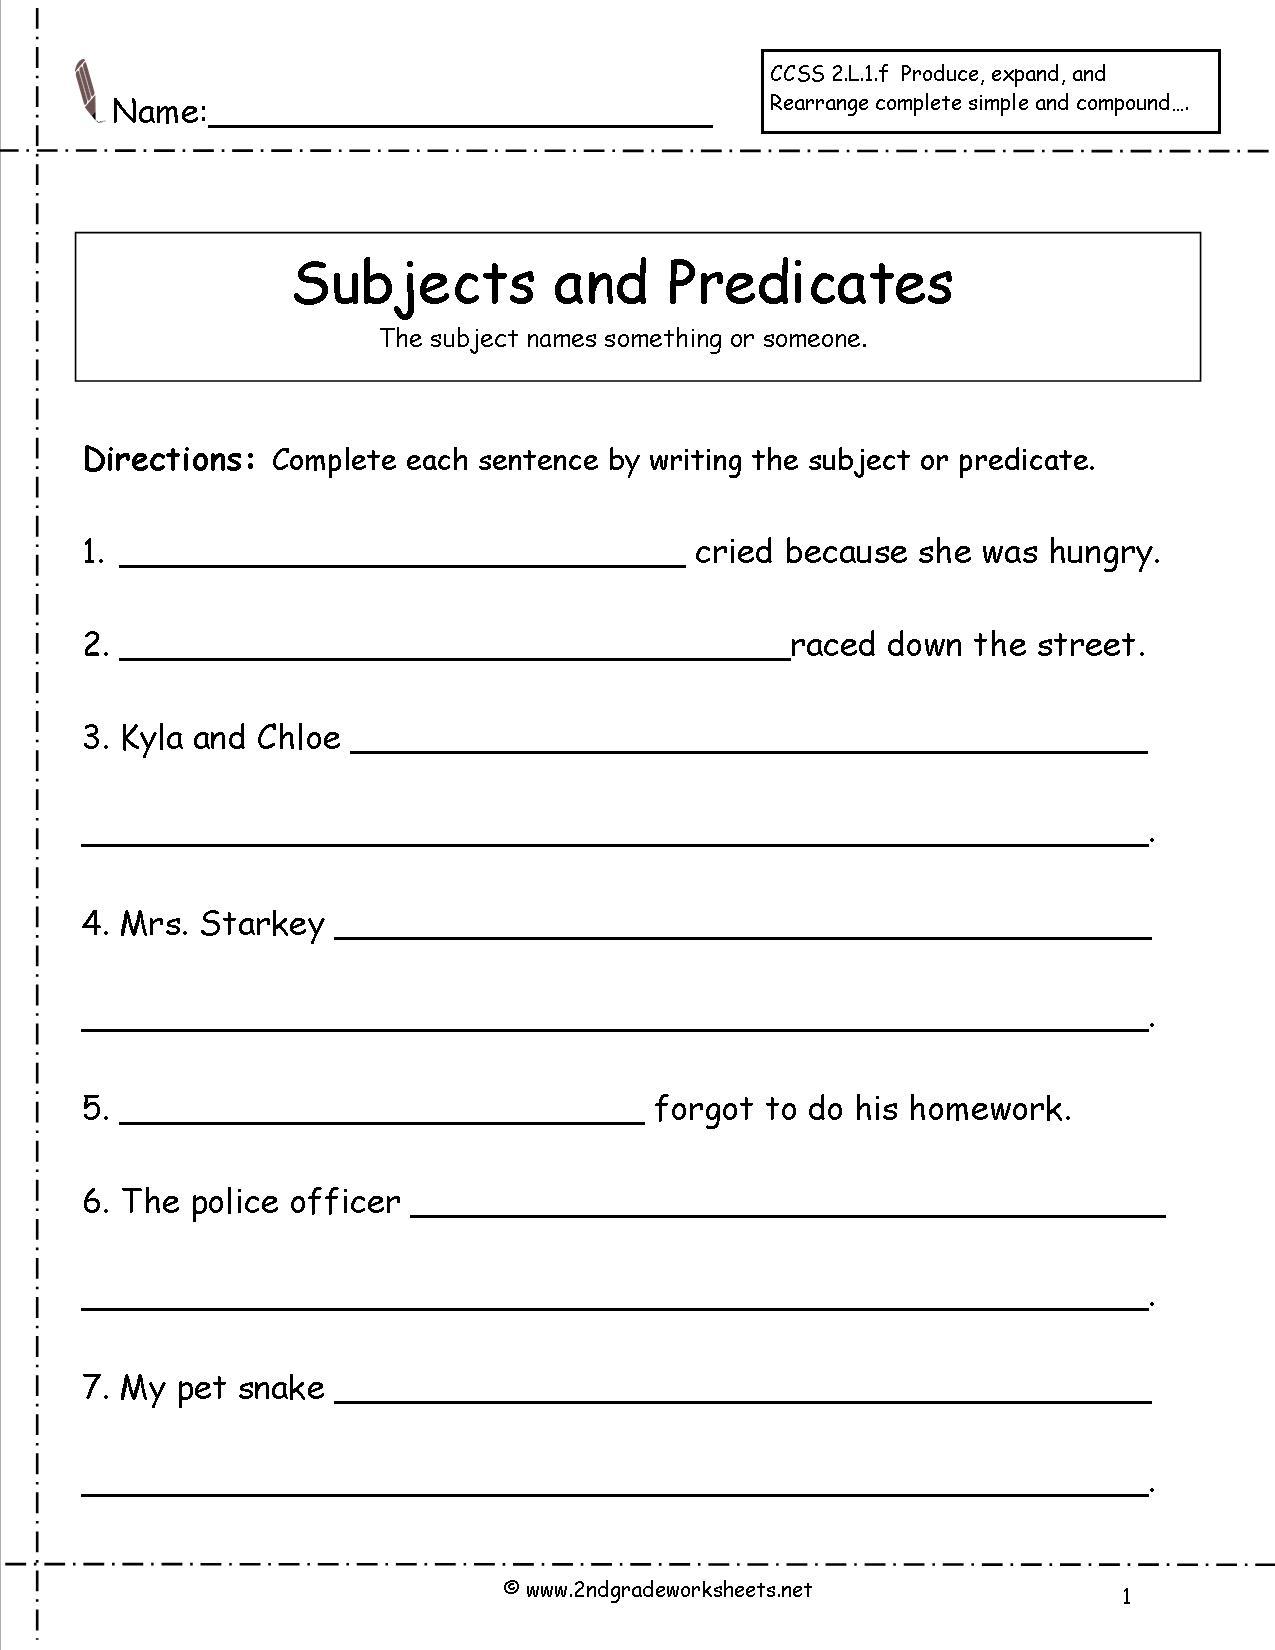 Worksheet On Types Of Sentences Grade 3